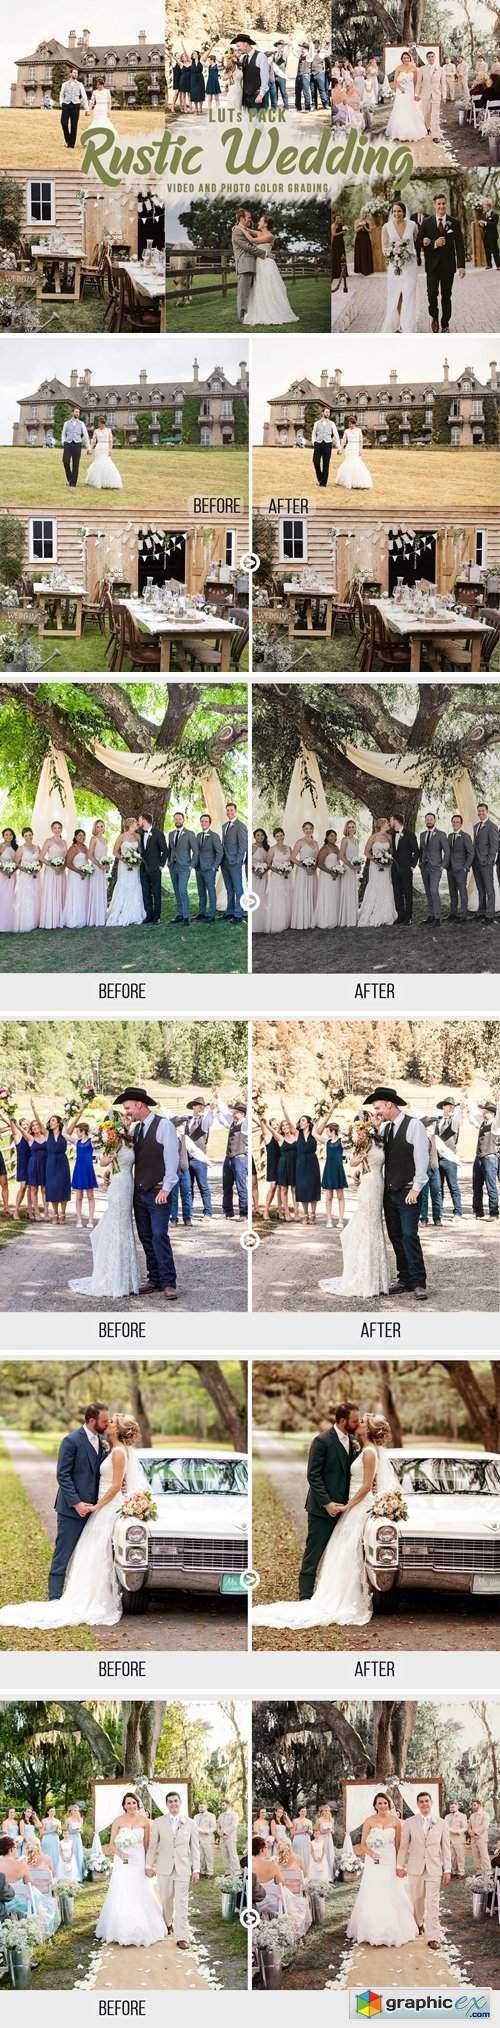 Rustic Wedding LUTs - Video Color Grading Filters